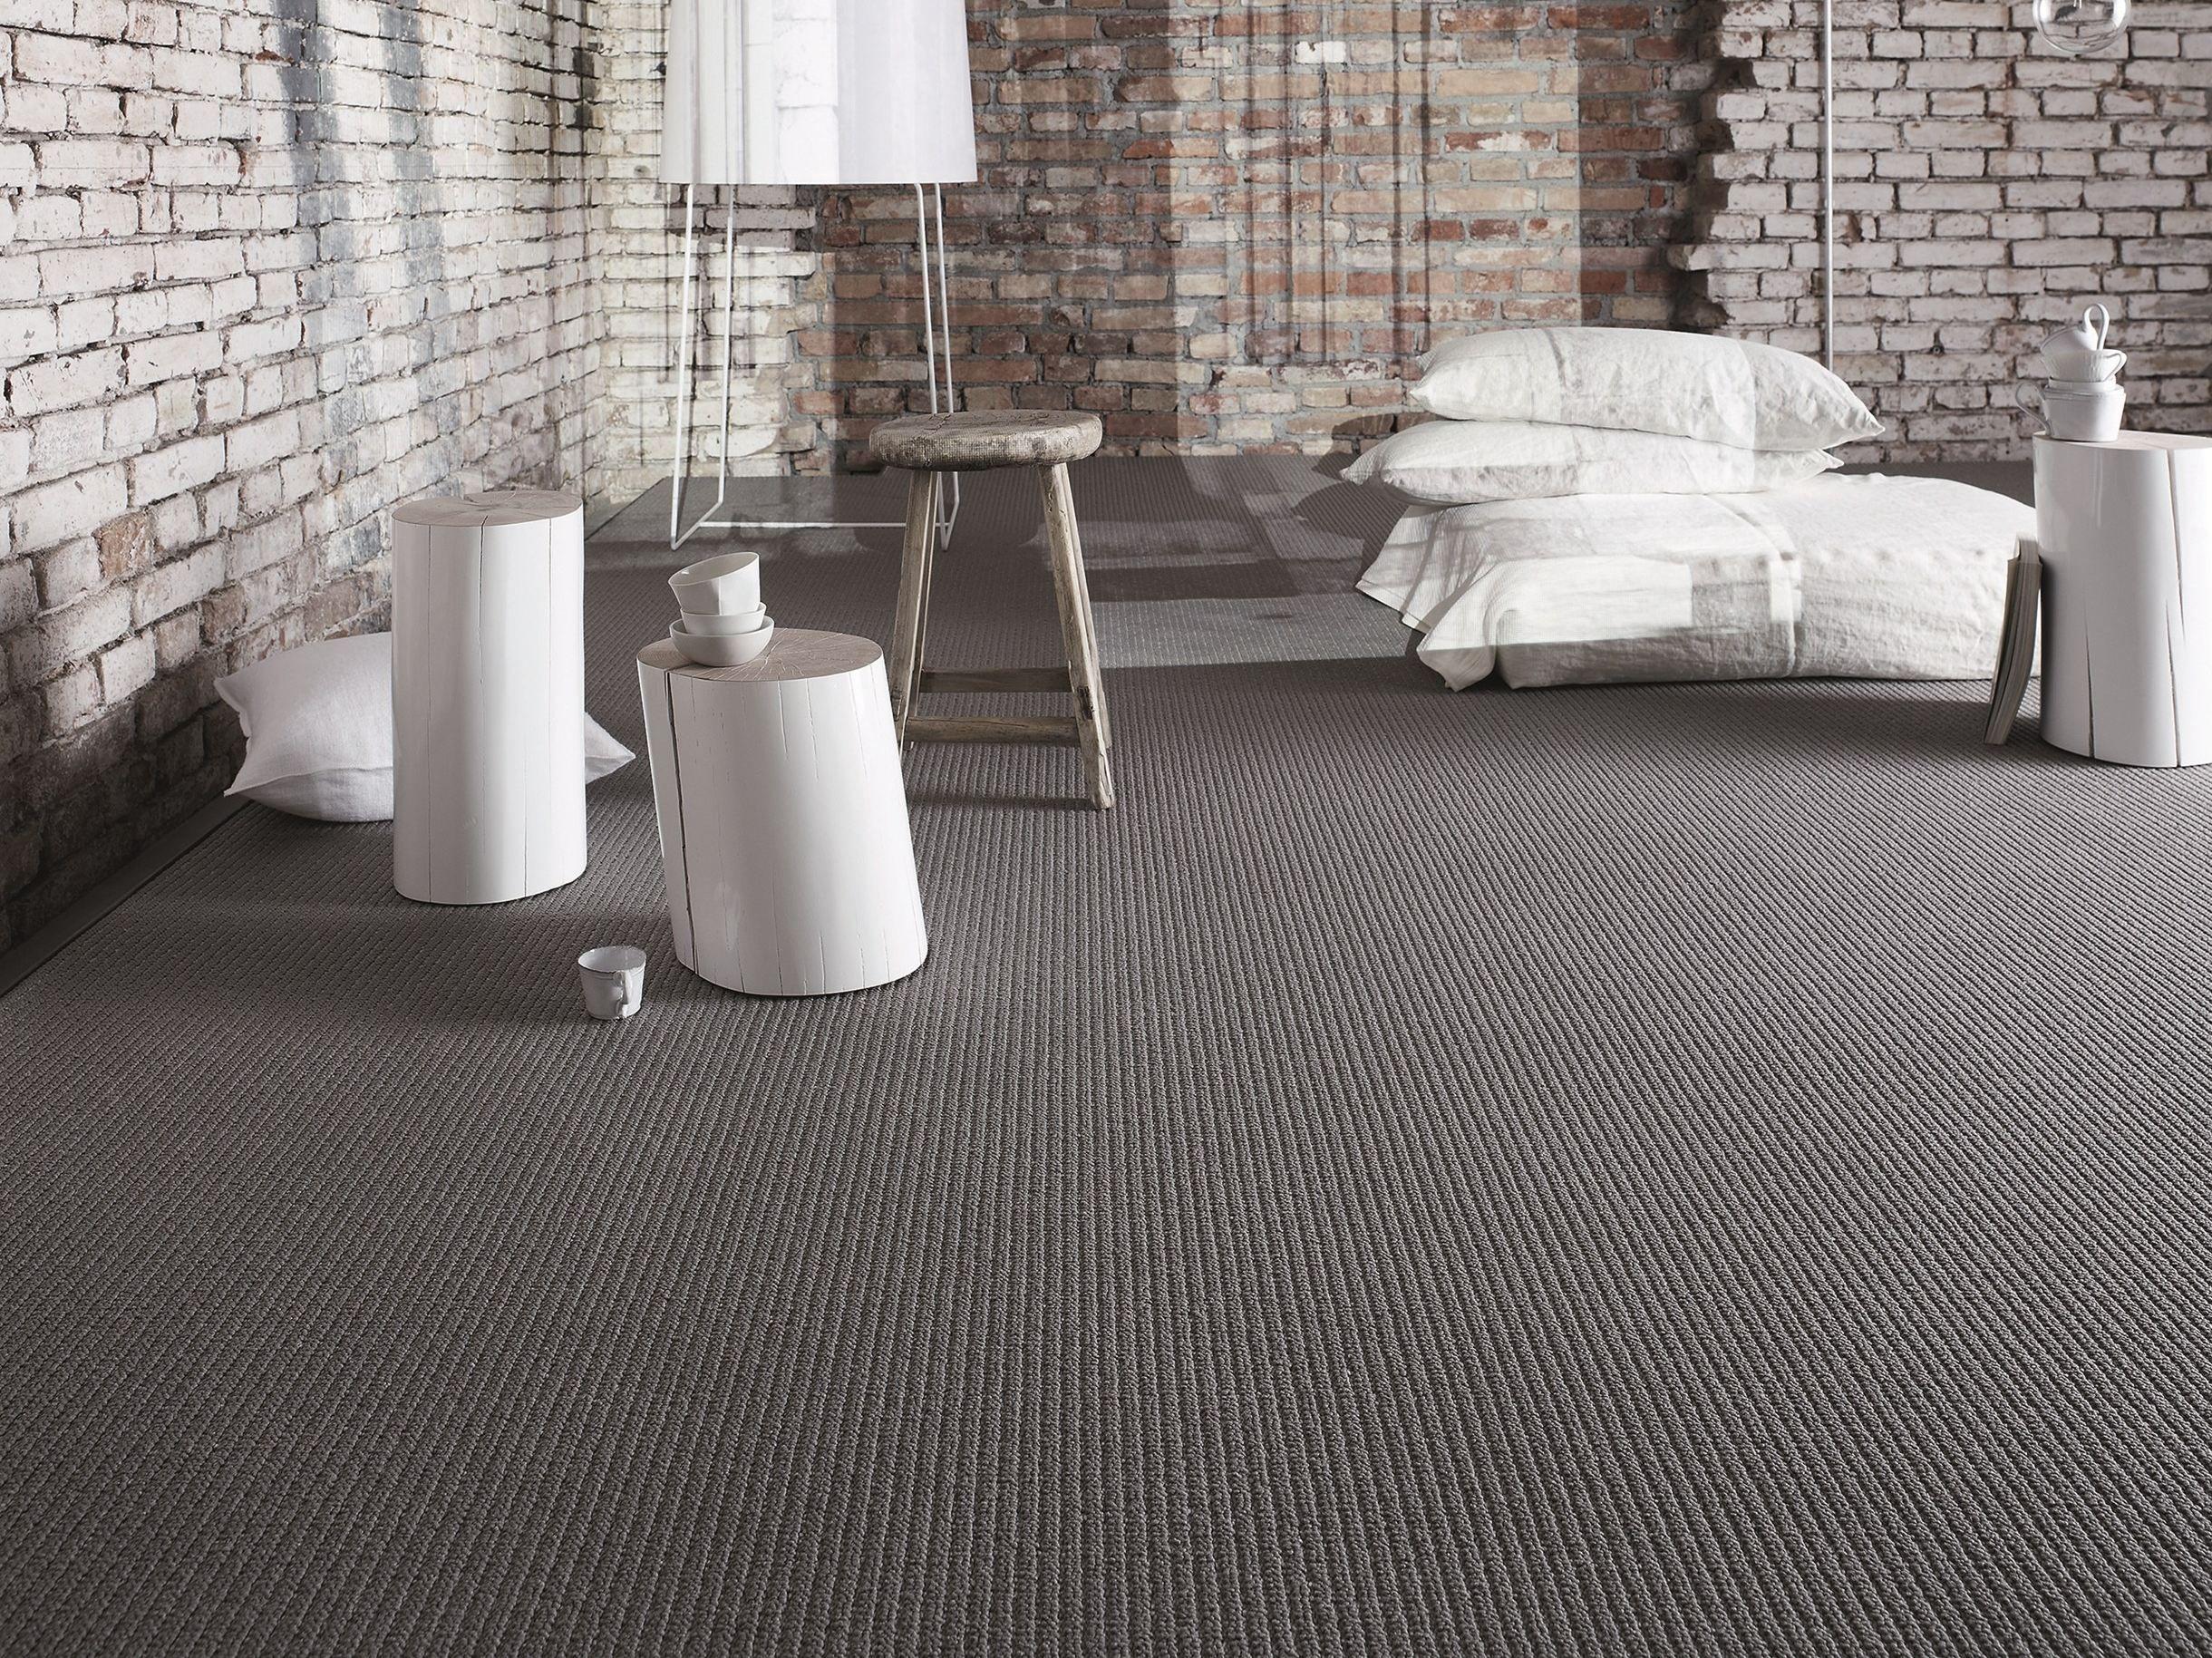 moquette uni ritz 900 by object carpet gmbh design matteo thun. Black Bedroom Furniture Sets. Home Design Ideas